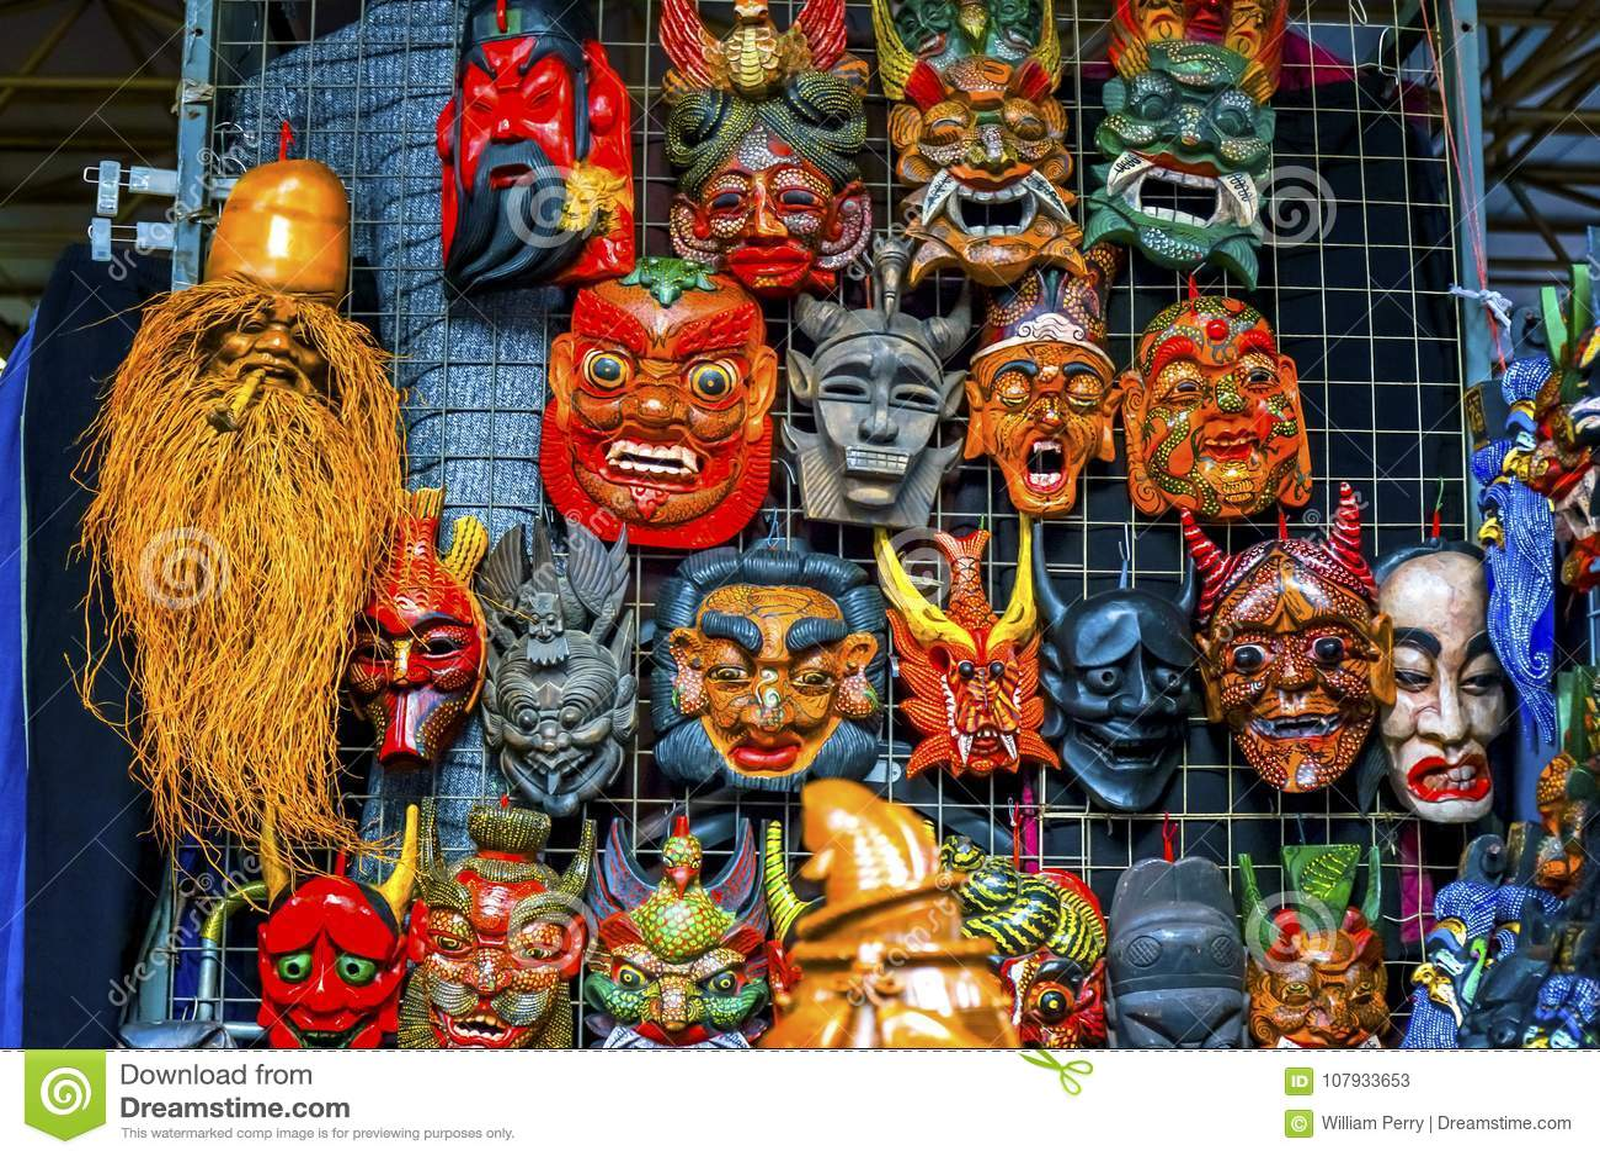 Chinese Replica Wooden Masks Decorations Panjuan Flea Market